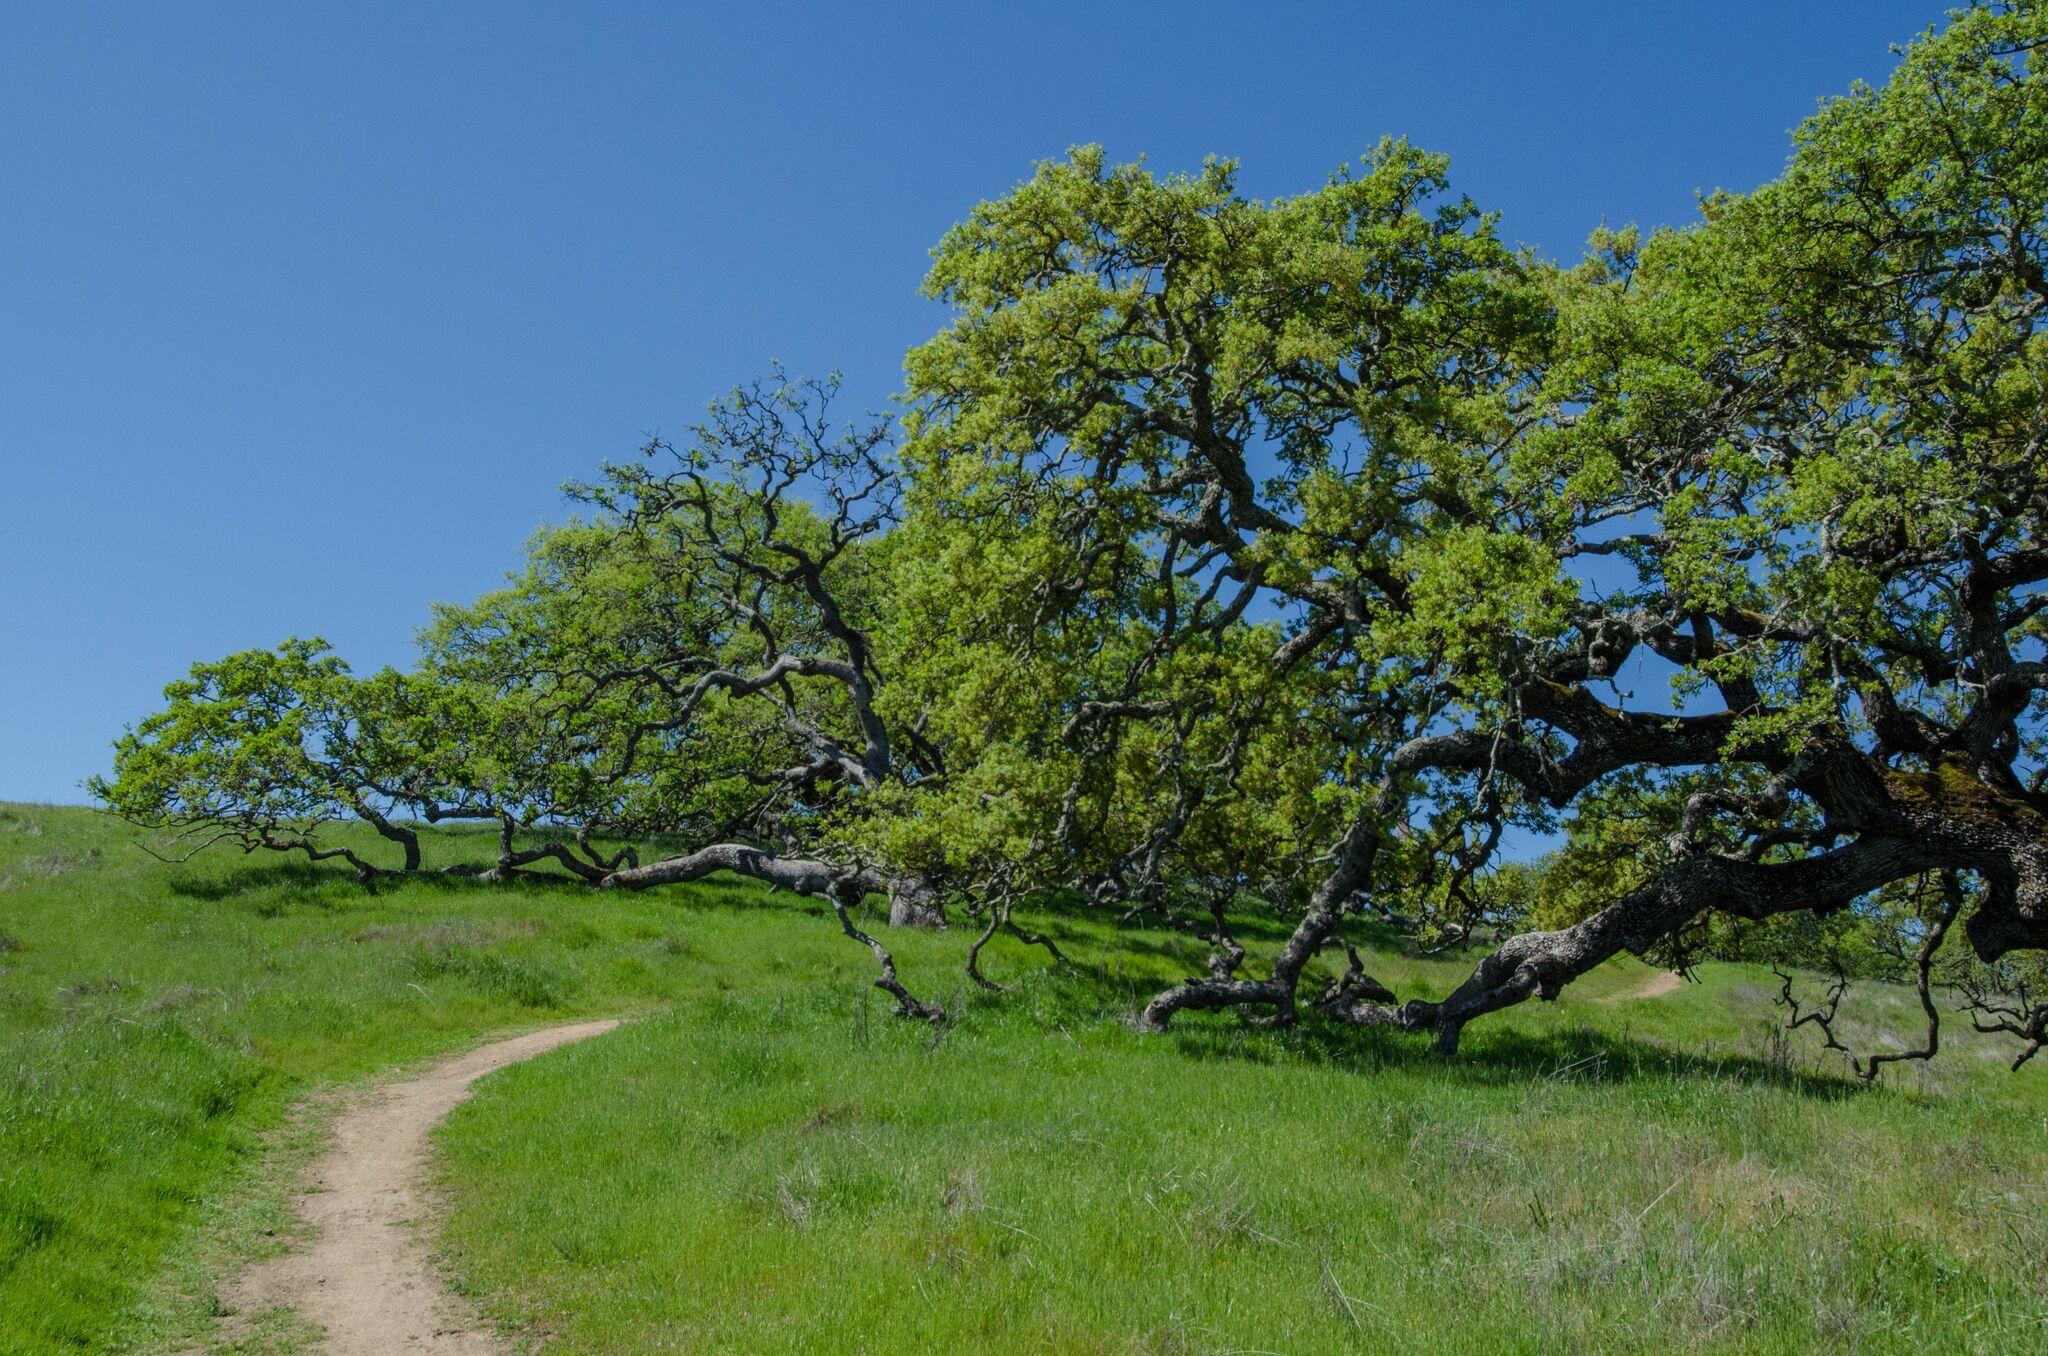 Mayfair-Trail_Rancho-Canada-del-Oro-Open-Space-Preserve_Cassie-Kifer-25_preview